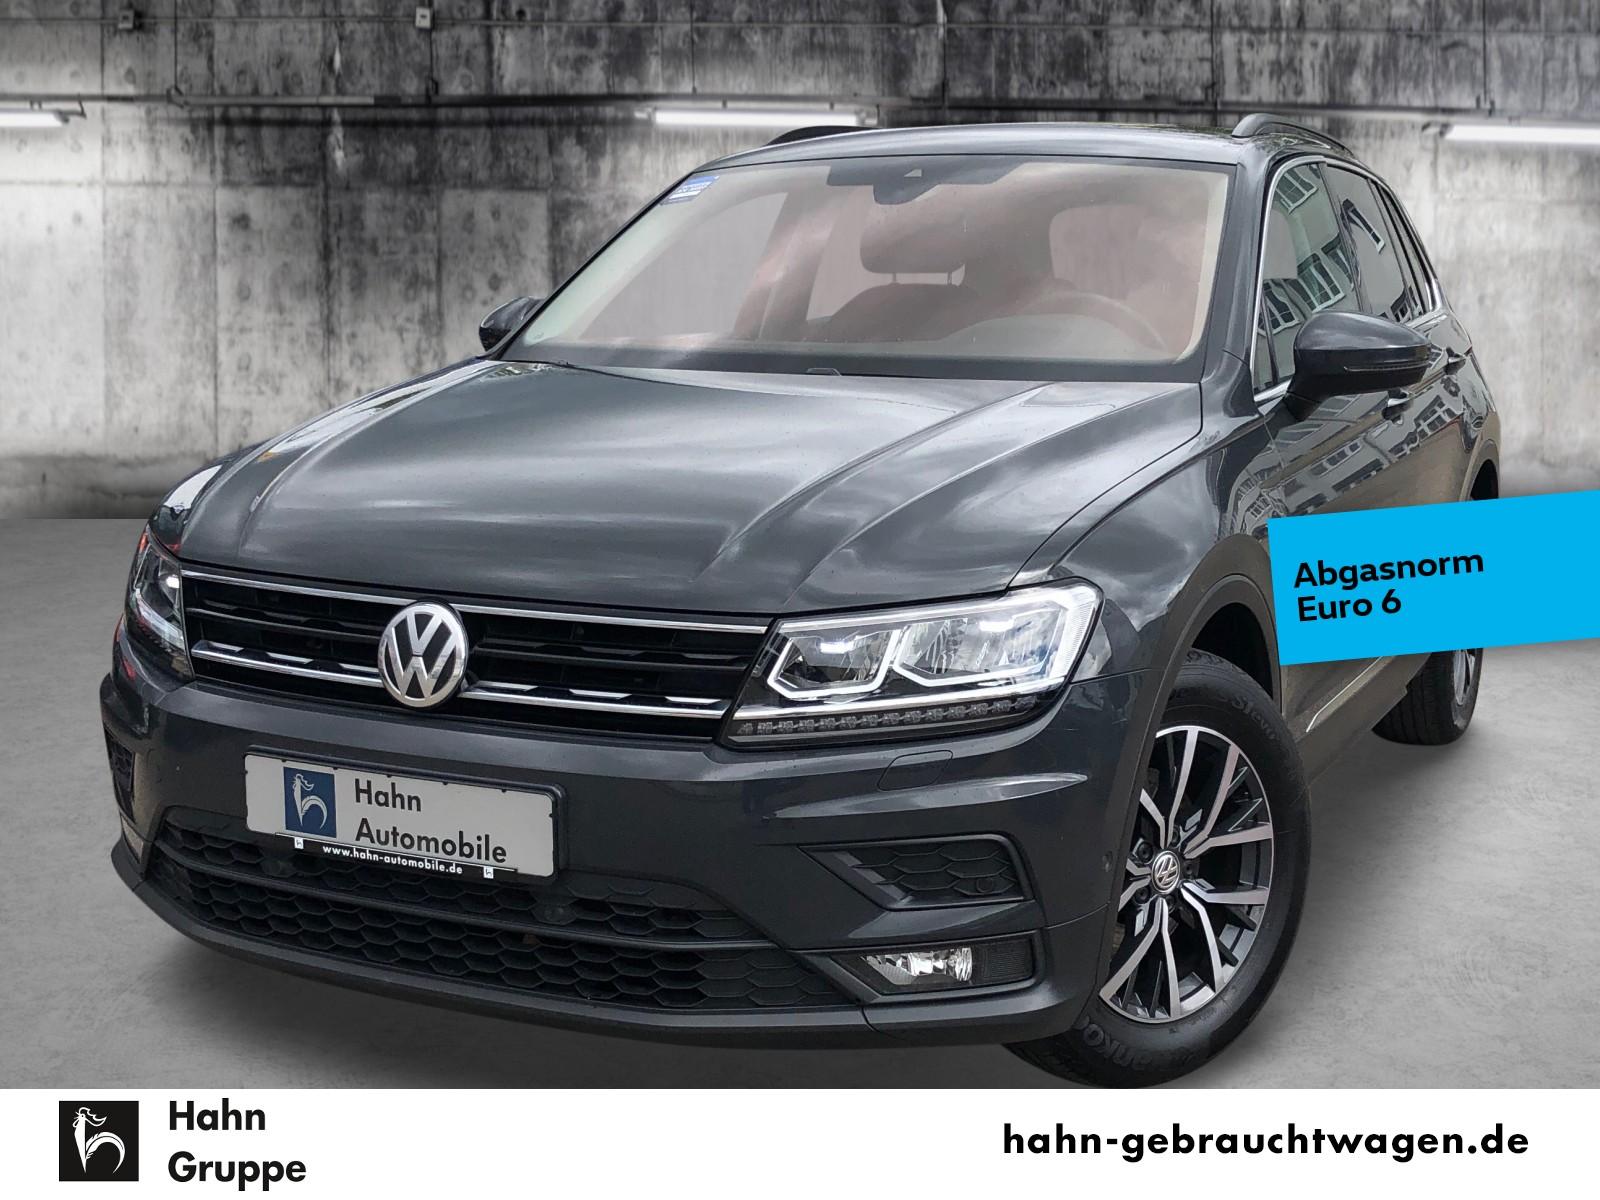 Volkswagen Tiguan Comfortline 2.0TDI DSG ACC Navi Sitzh LED, Jahr 2018, Diesel